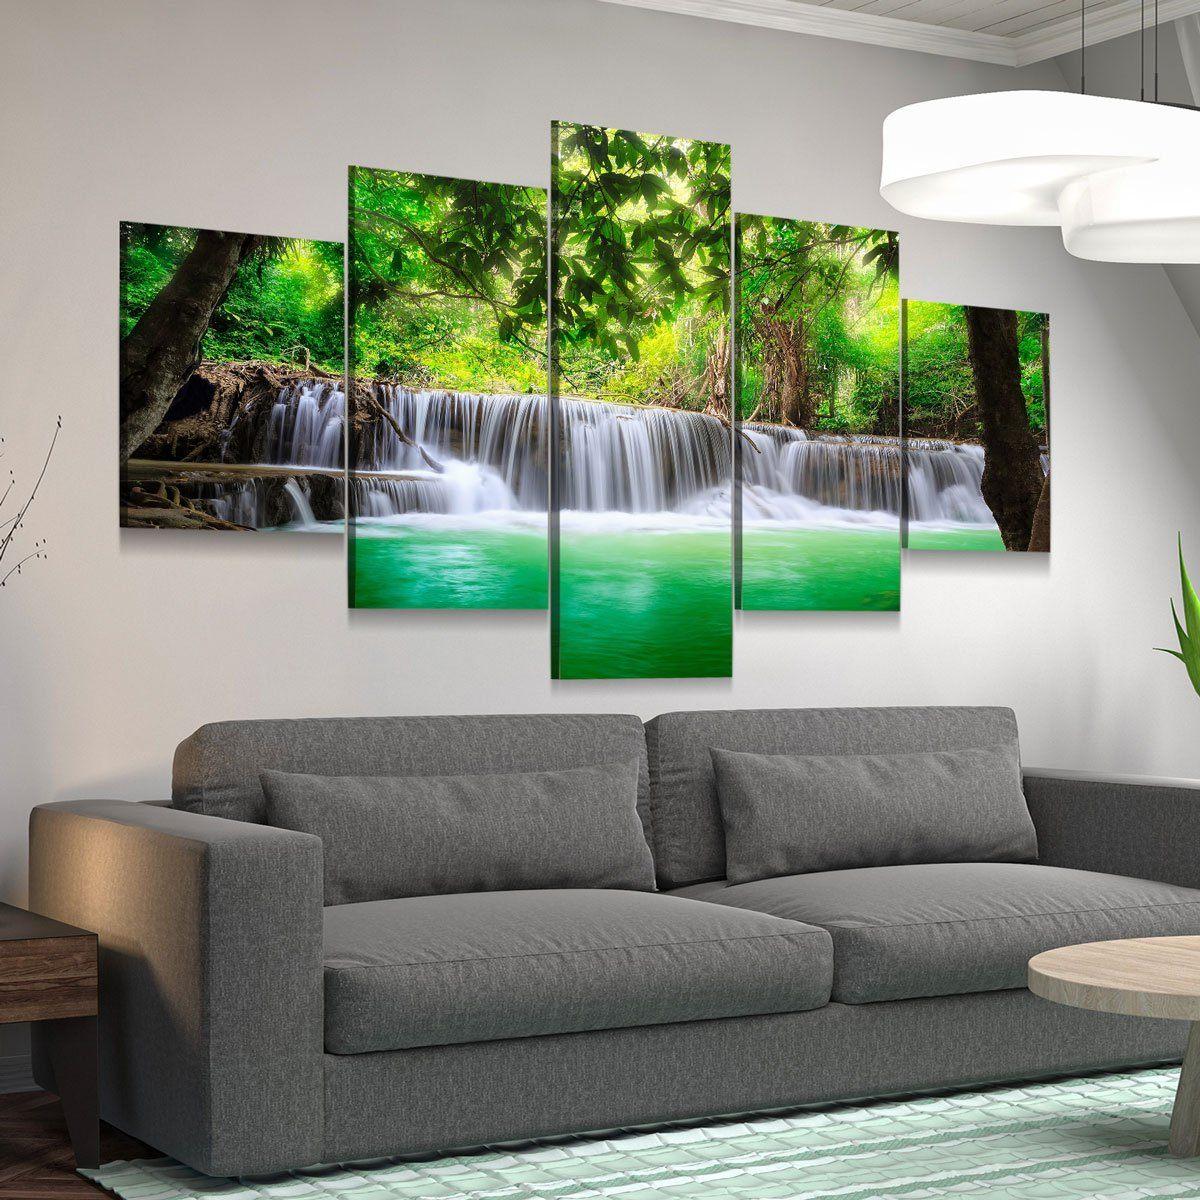 Green Tropical Waterfall 5 panel canvas wall art